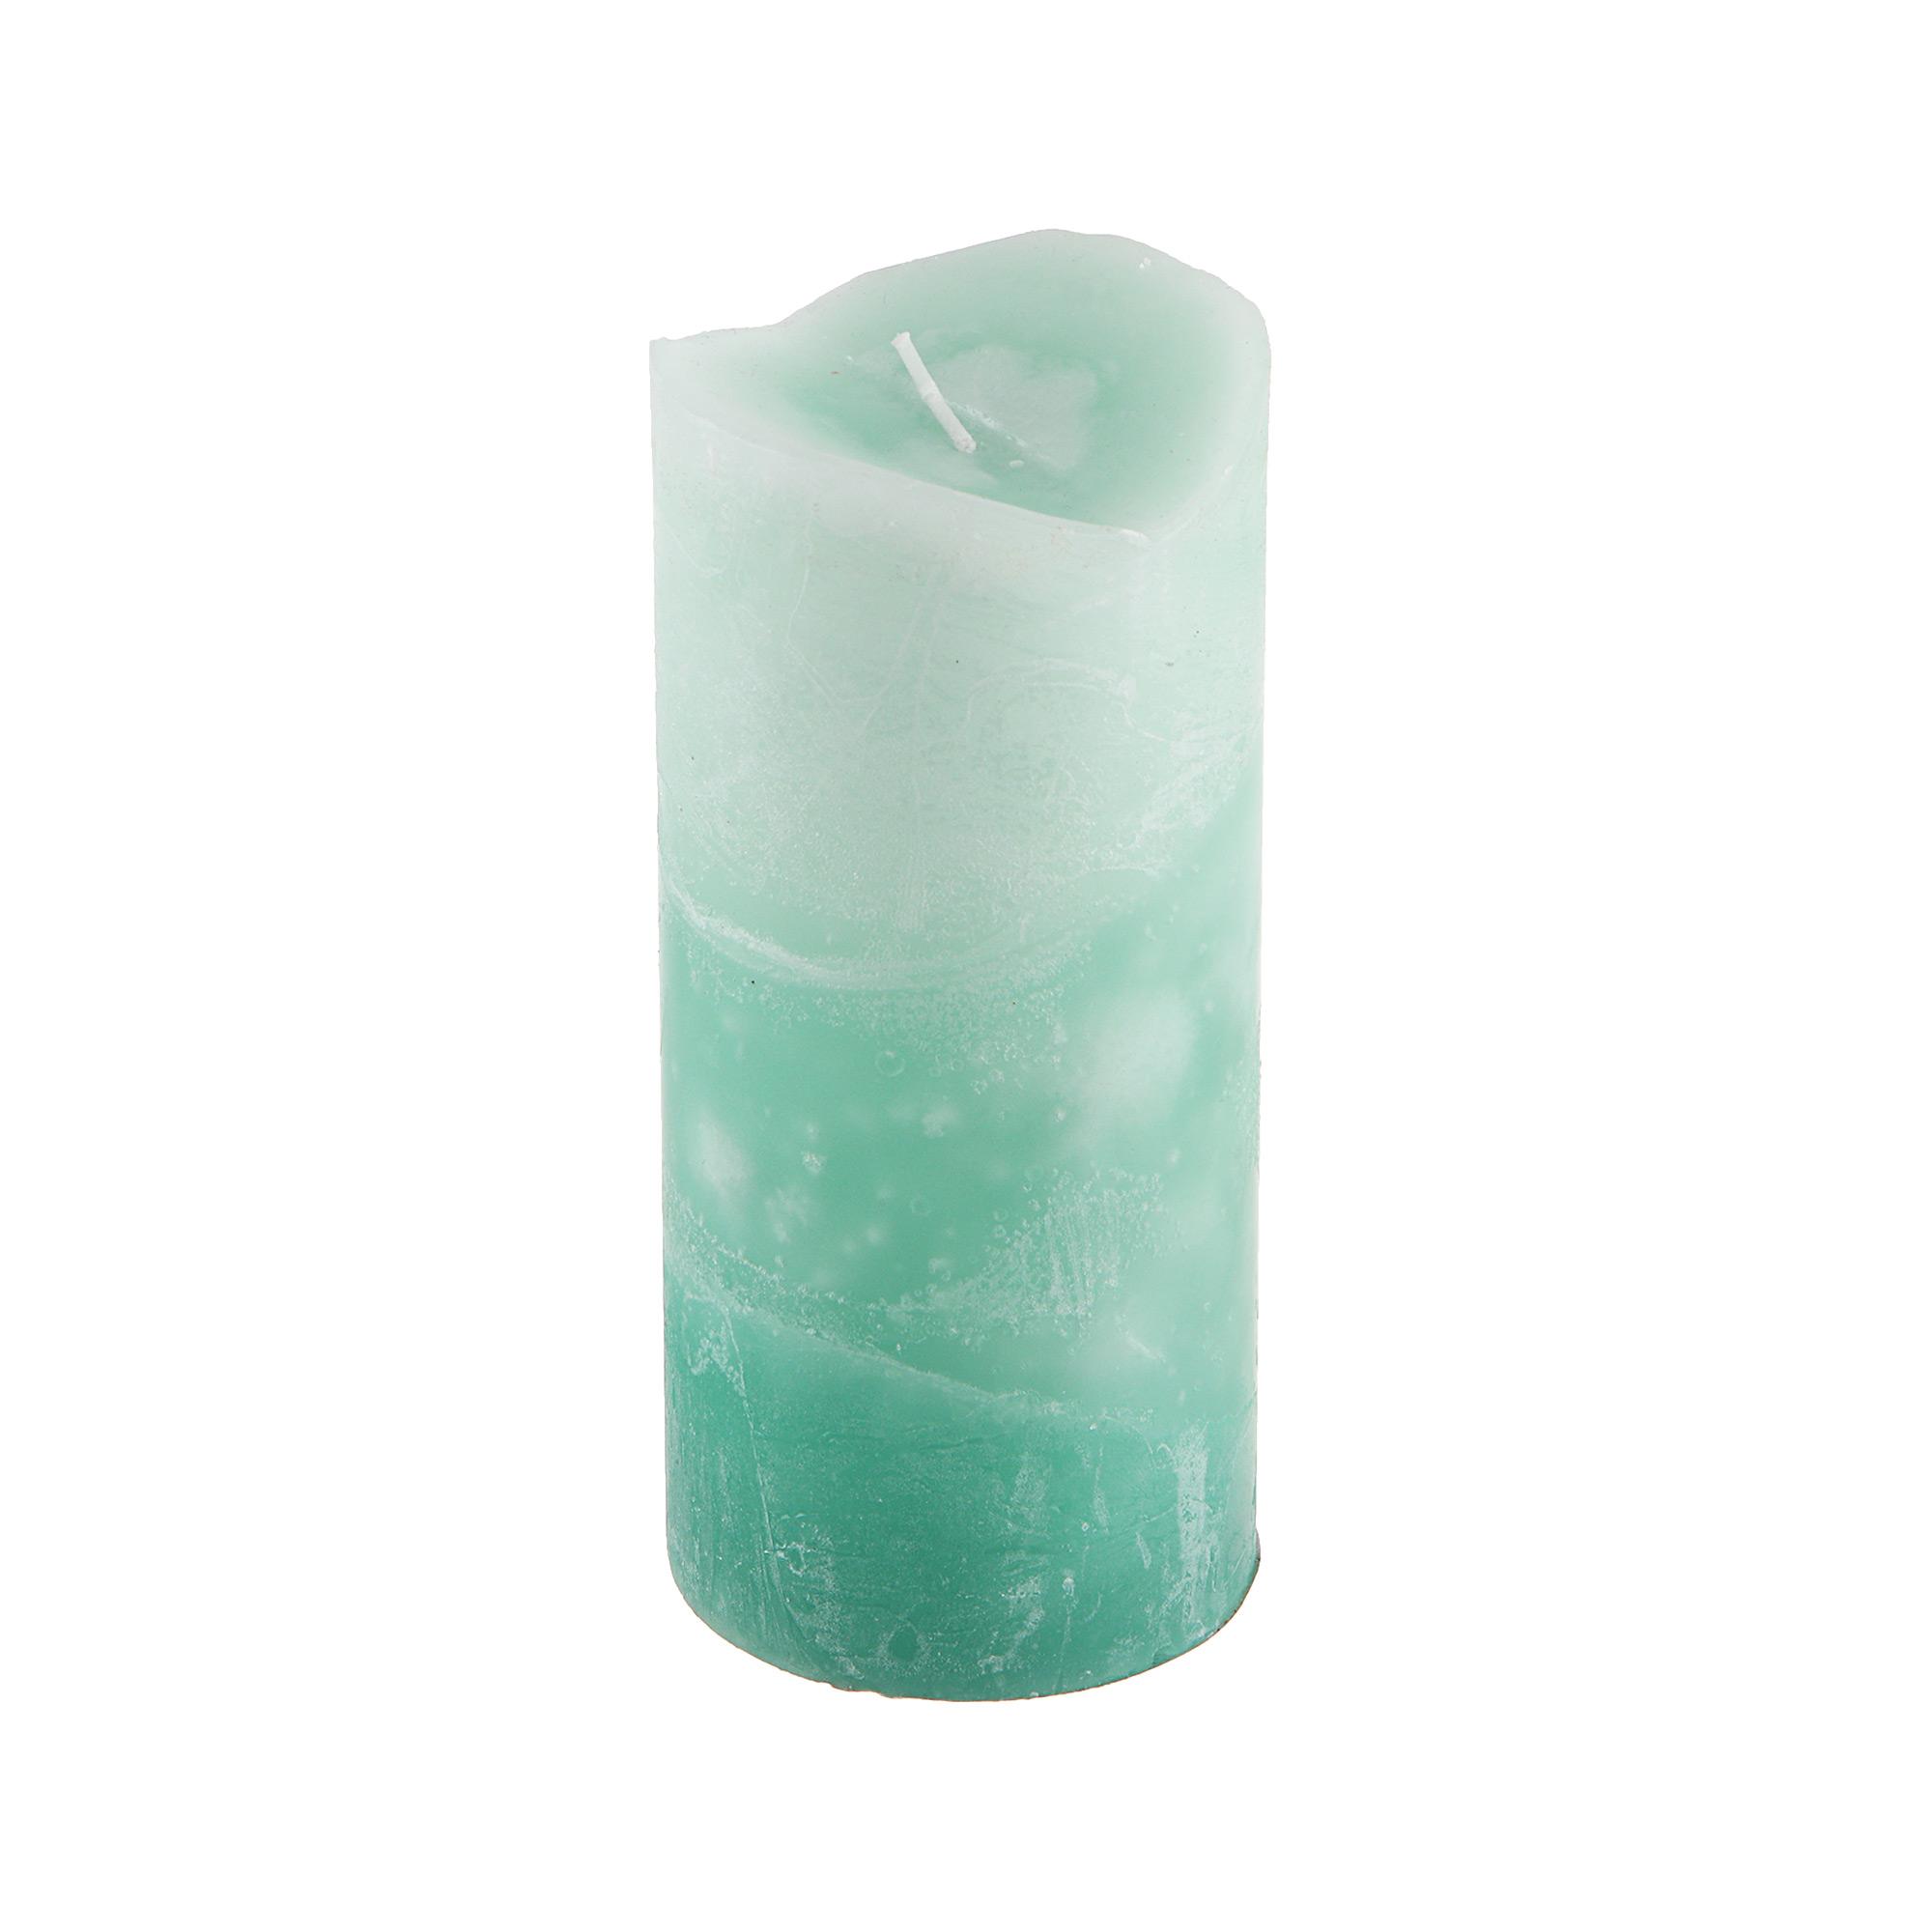 Свеча ароматическая гиацинт Sunford 6.8х15см зеленая